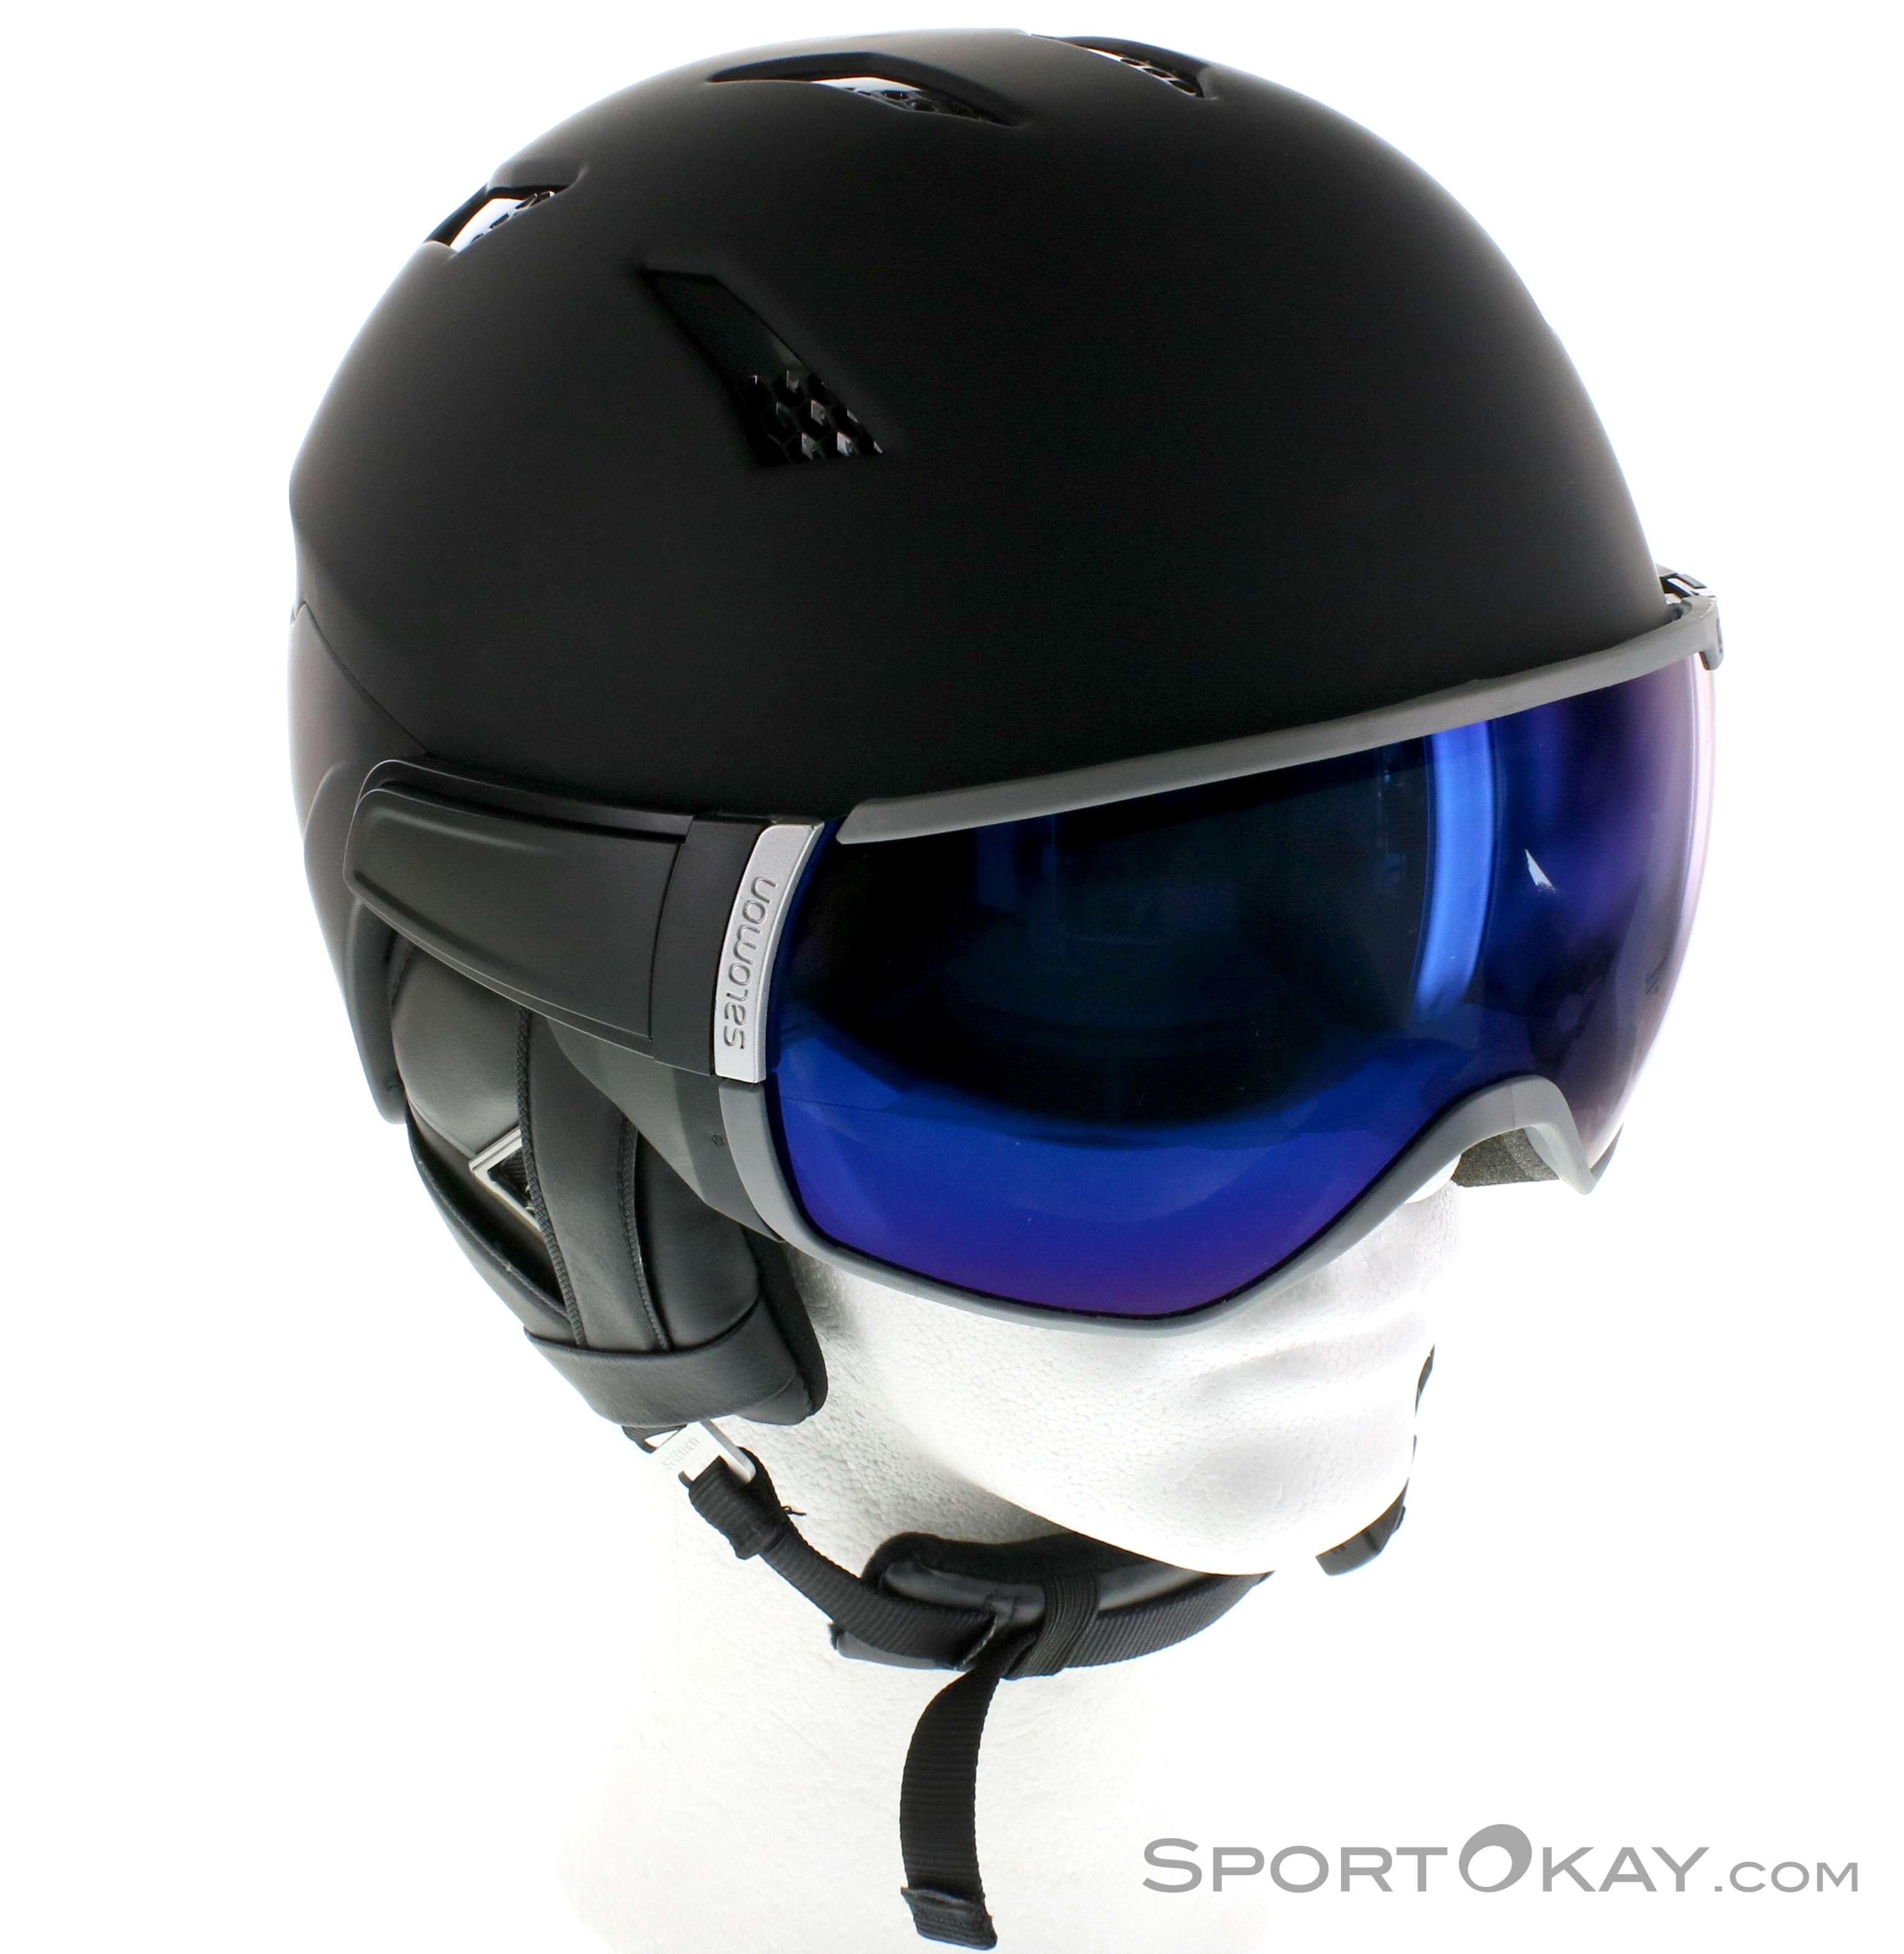 c277fb57bcb4 Salomon Driver Plus Ski Helmet - Ski Helmets - Ski Helmets ...